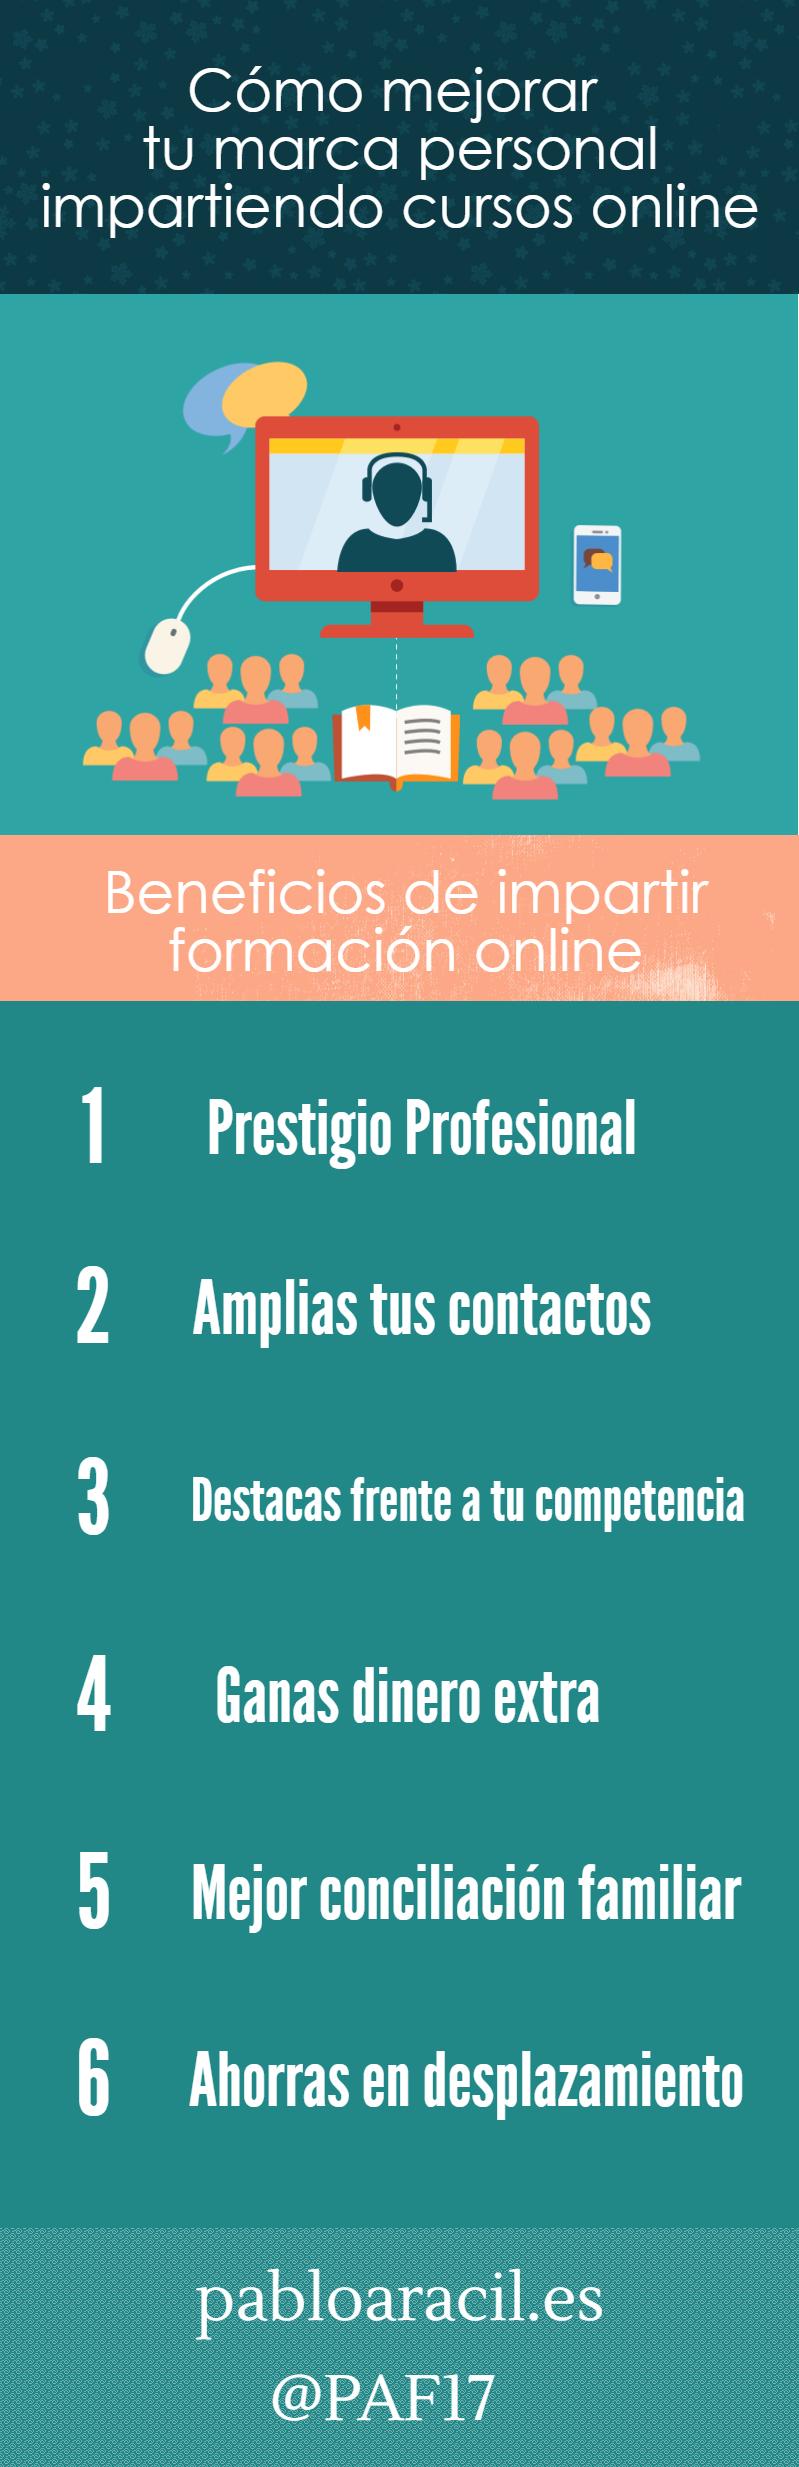 infografia cursos online